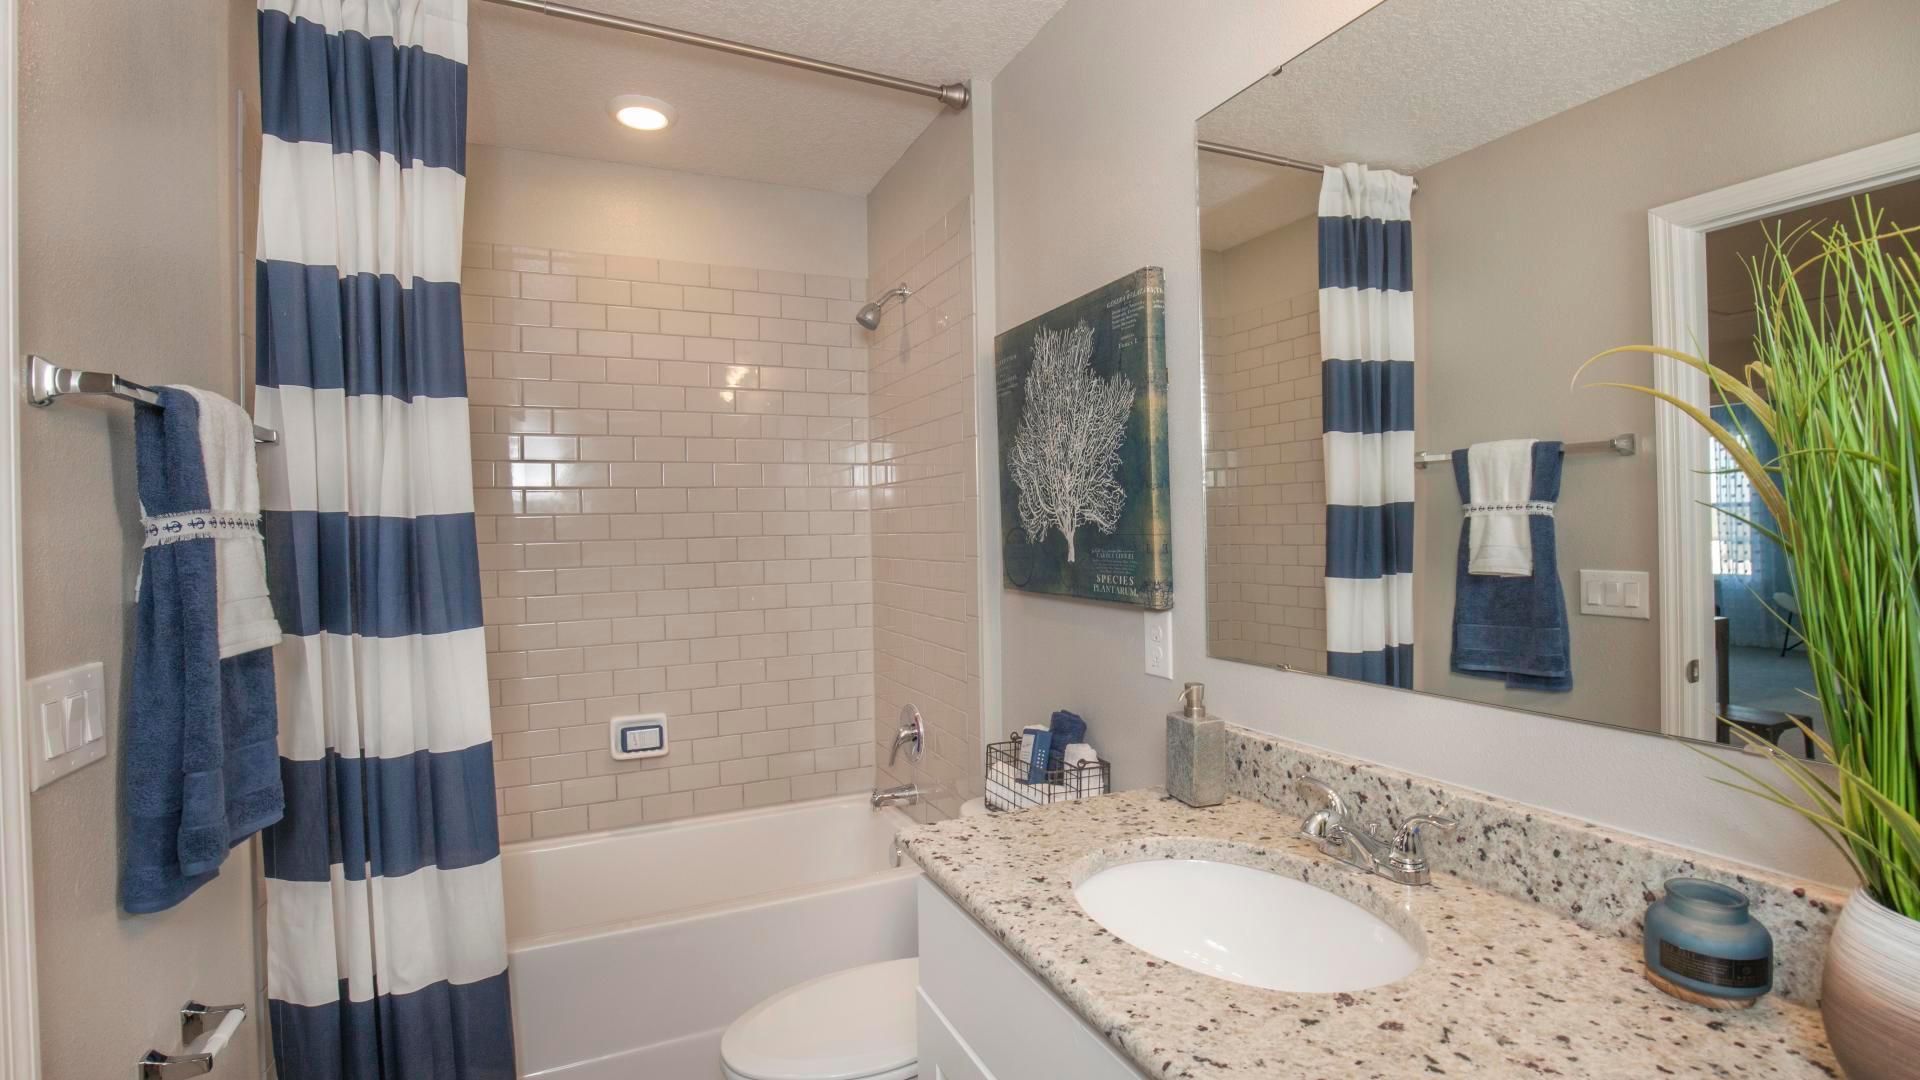 Bathroom featured in the Carlisle By Maronda Homes in Daytona Beach, FL